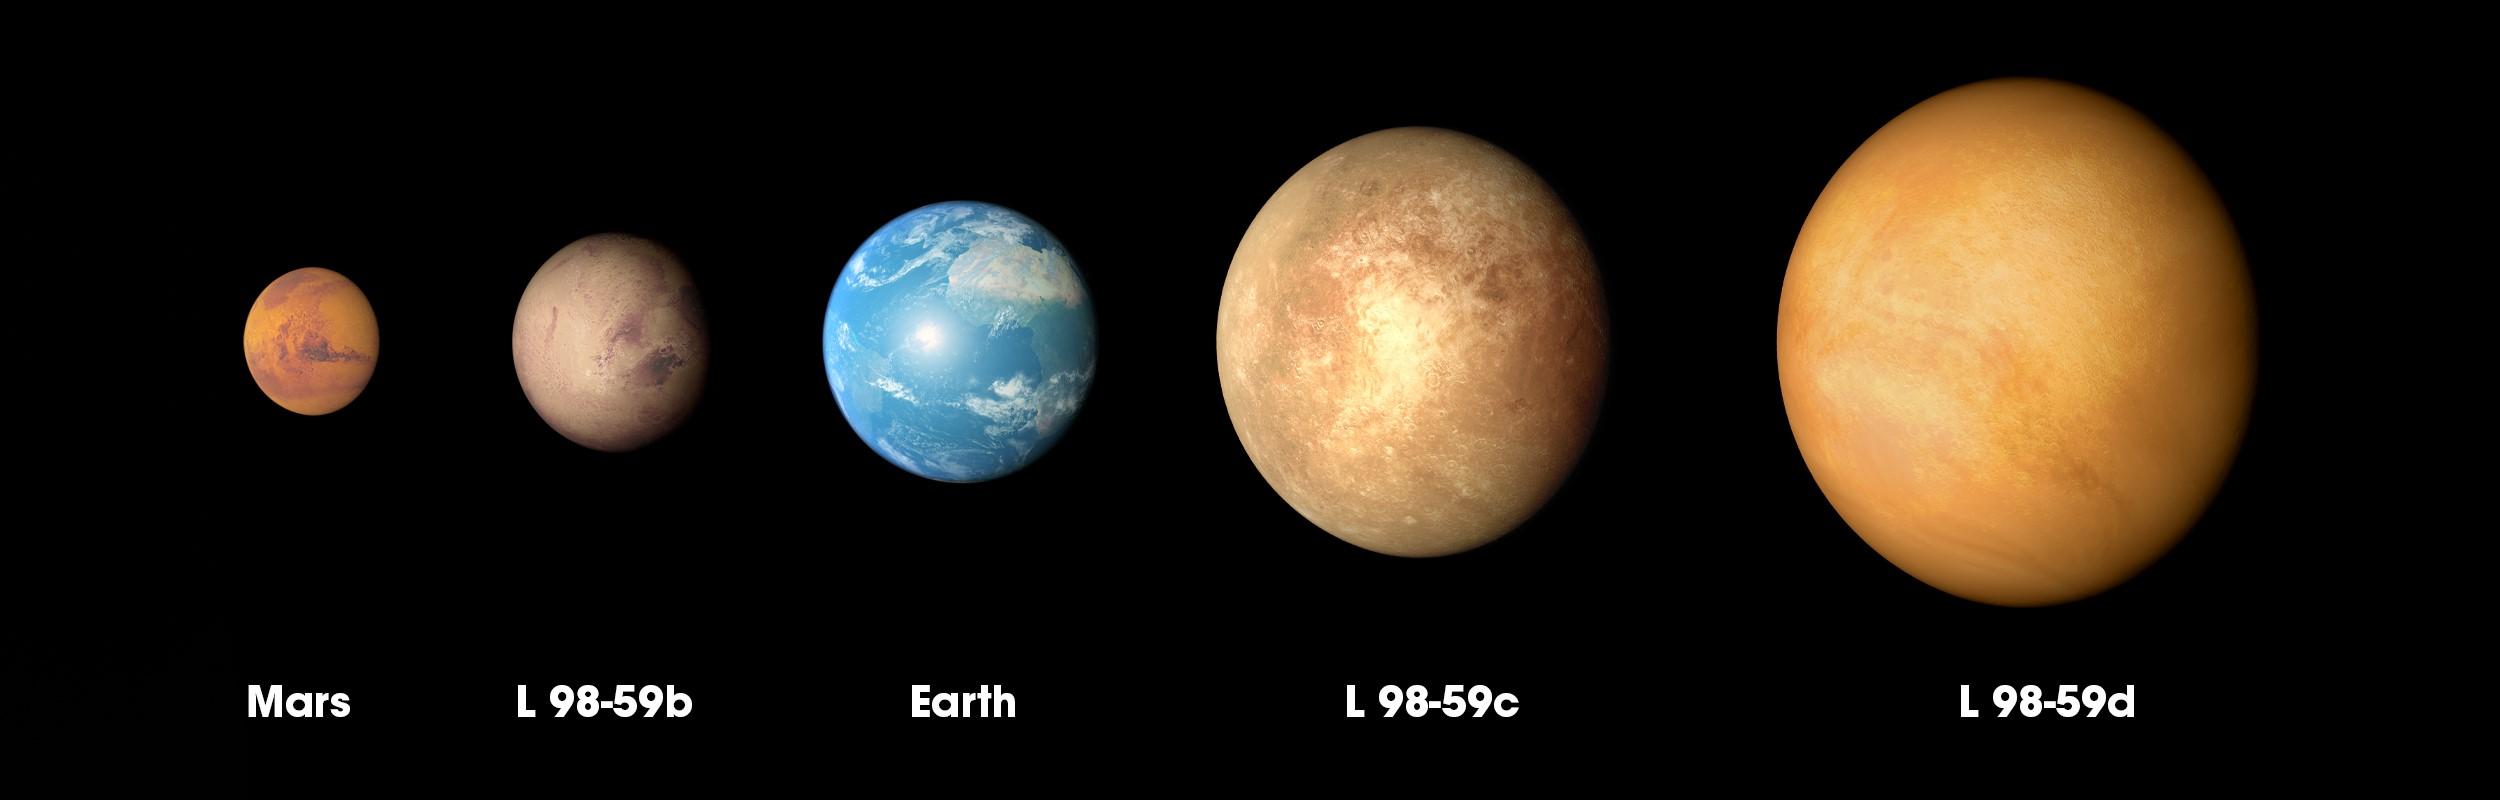 l98 59 planets